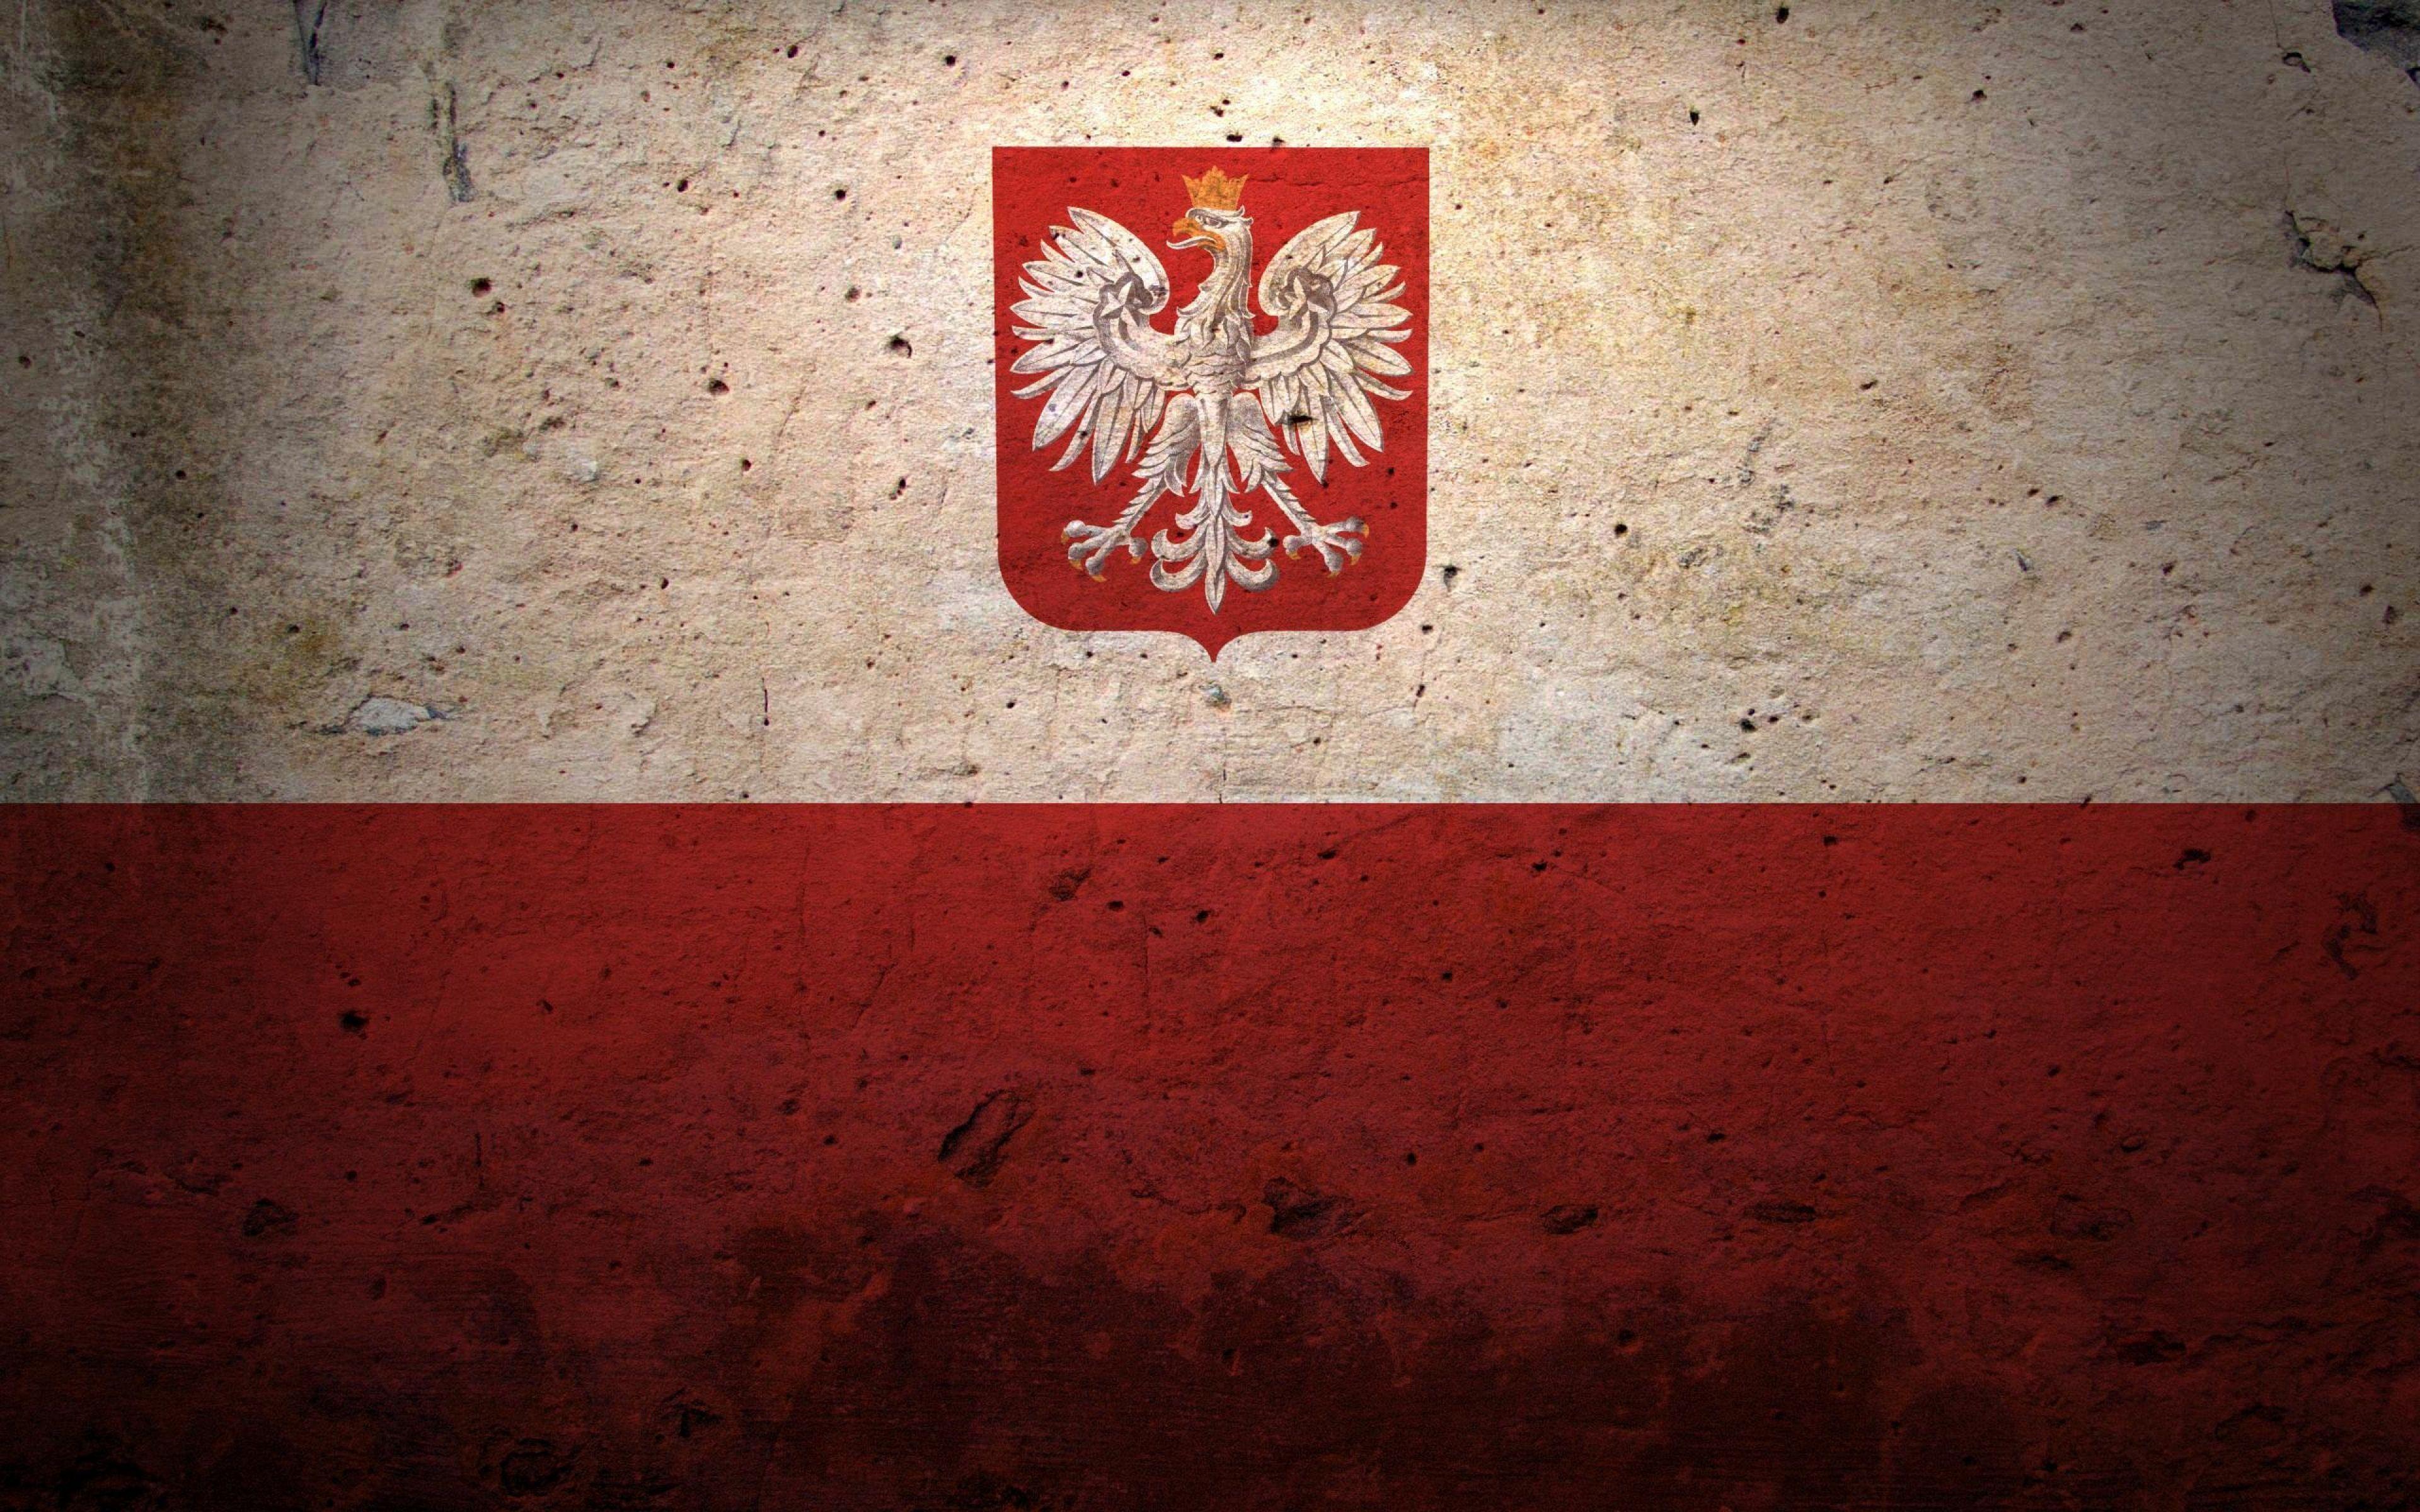 Flag Coat Of Arms Poland Symbols Texture 50751 3840x2400 Jpg 3840